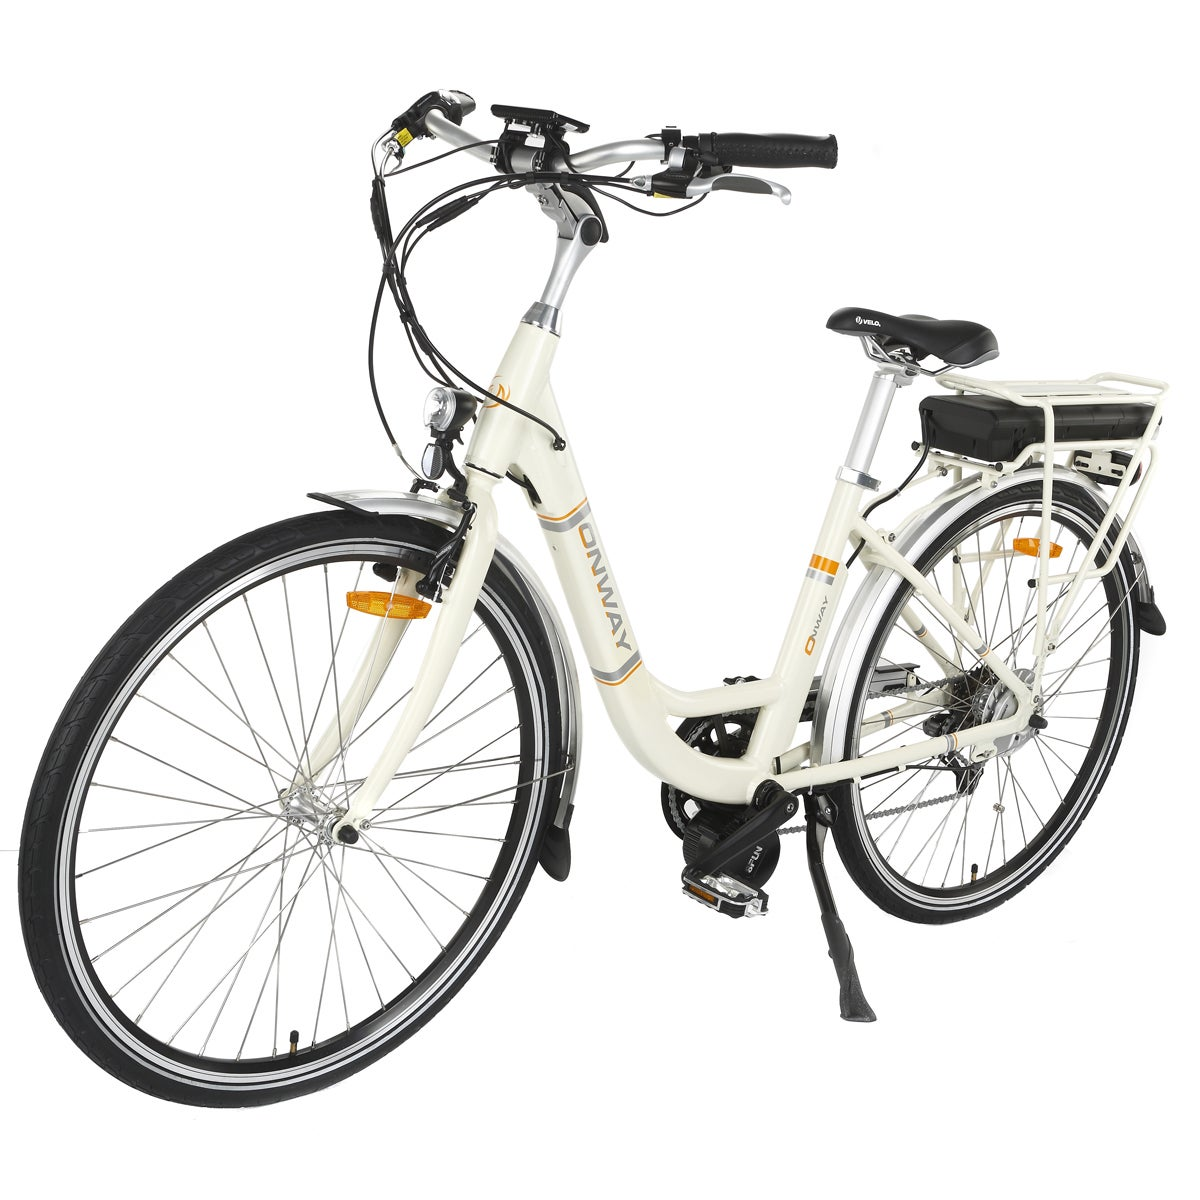 Onway Women's White Aluminum 28-inch 7-speed City E-bike ...